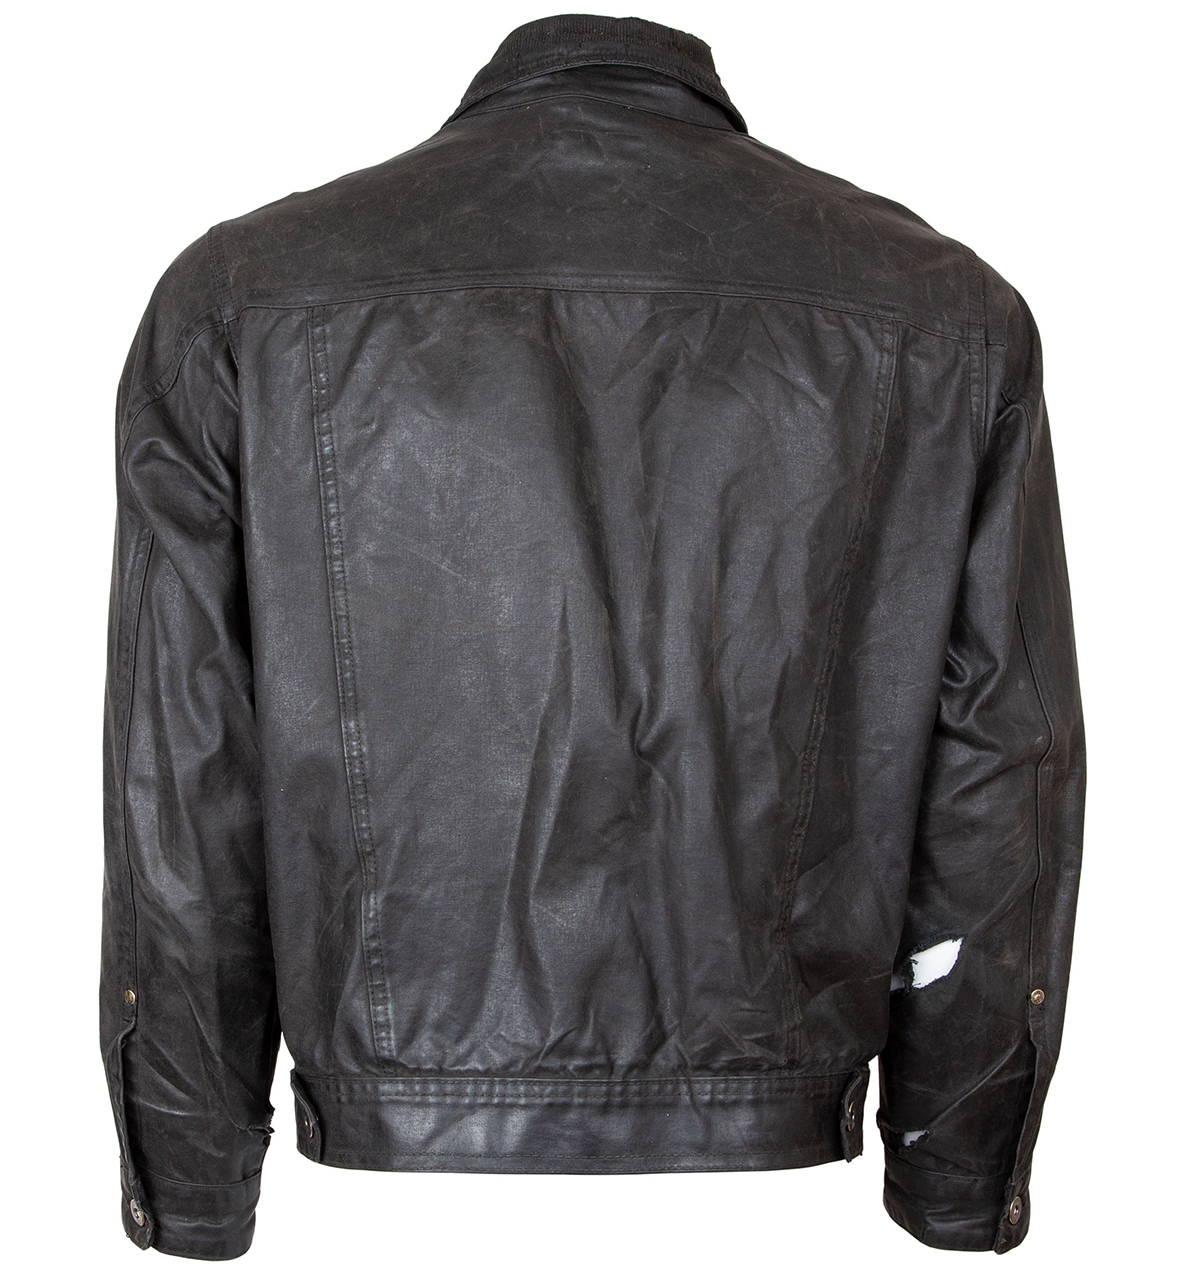 Iron & Resin Rambler Jacket Weathered & Worn Customer Repair Backside